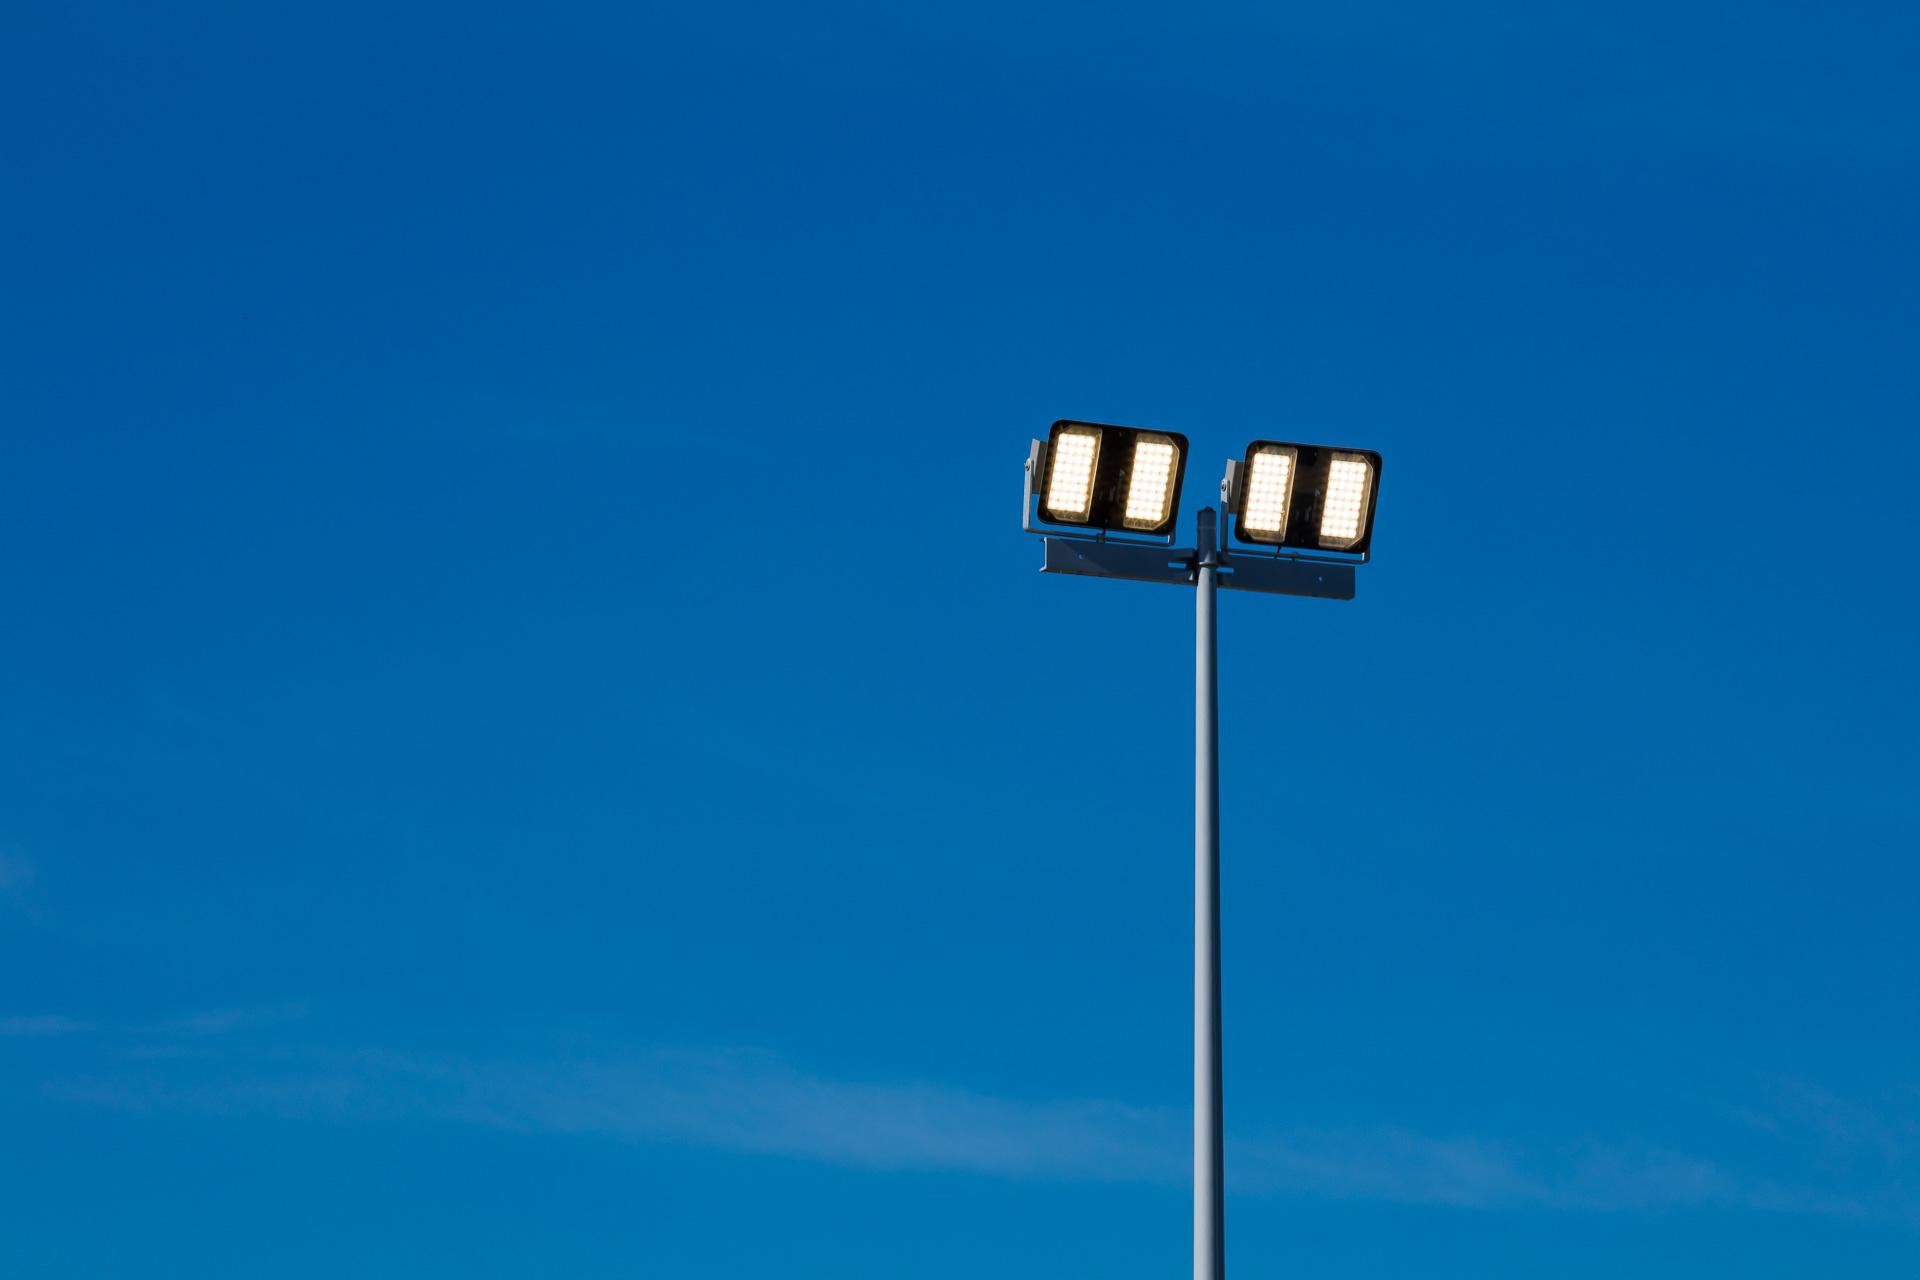 interieurfotografie-dtonic-electro-verbeke-full-061